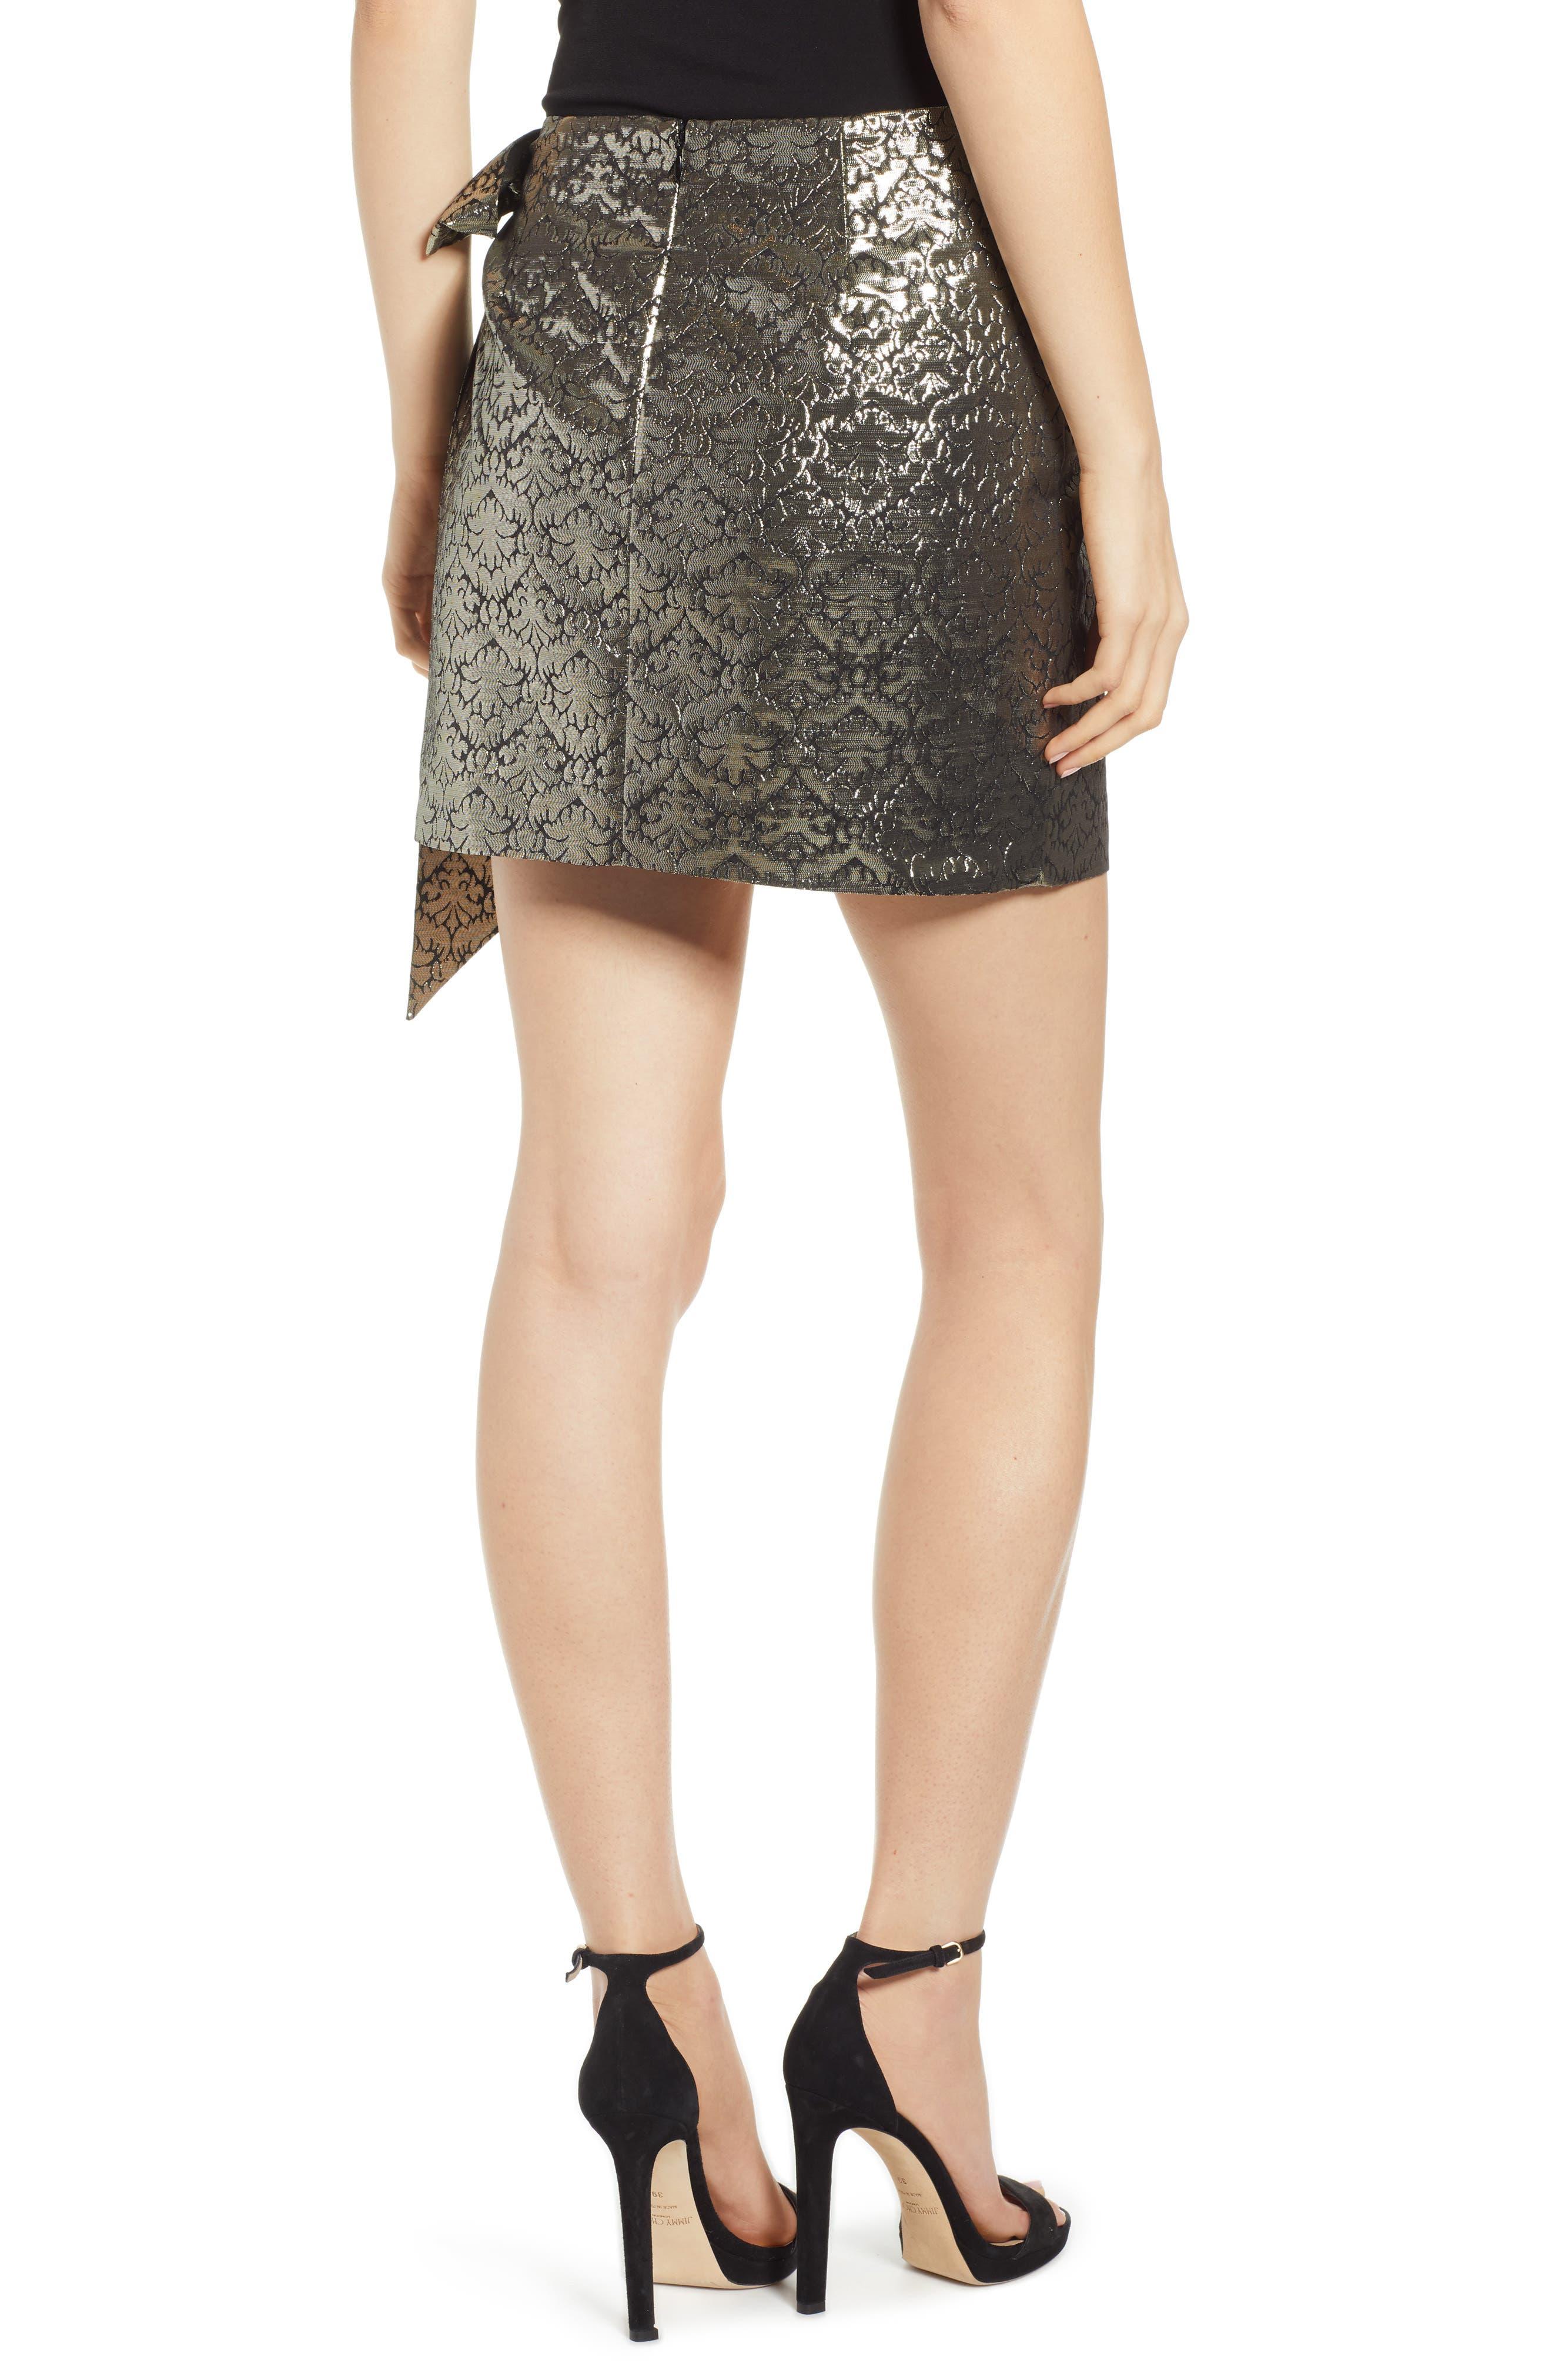 REBECCA MINKOFF, Augustina Shimmering Jacquard Faux Wrap Skirt, Alternate thumbnail 2, color, 710